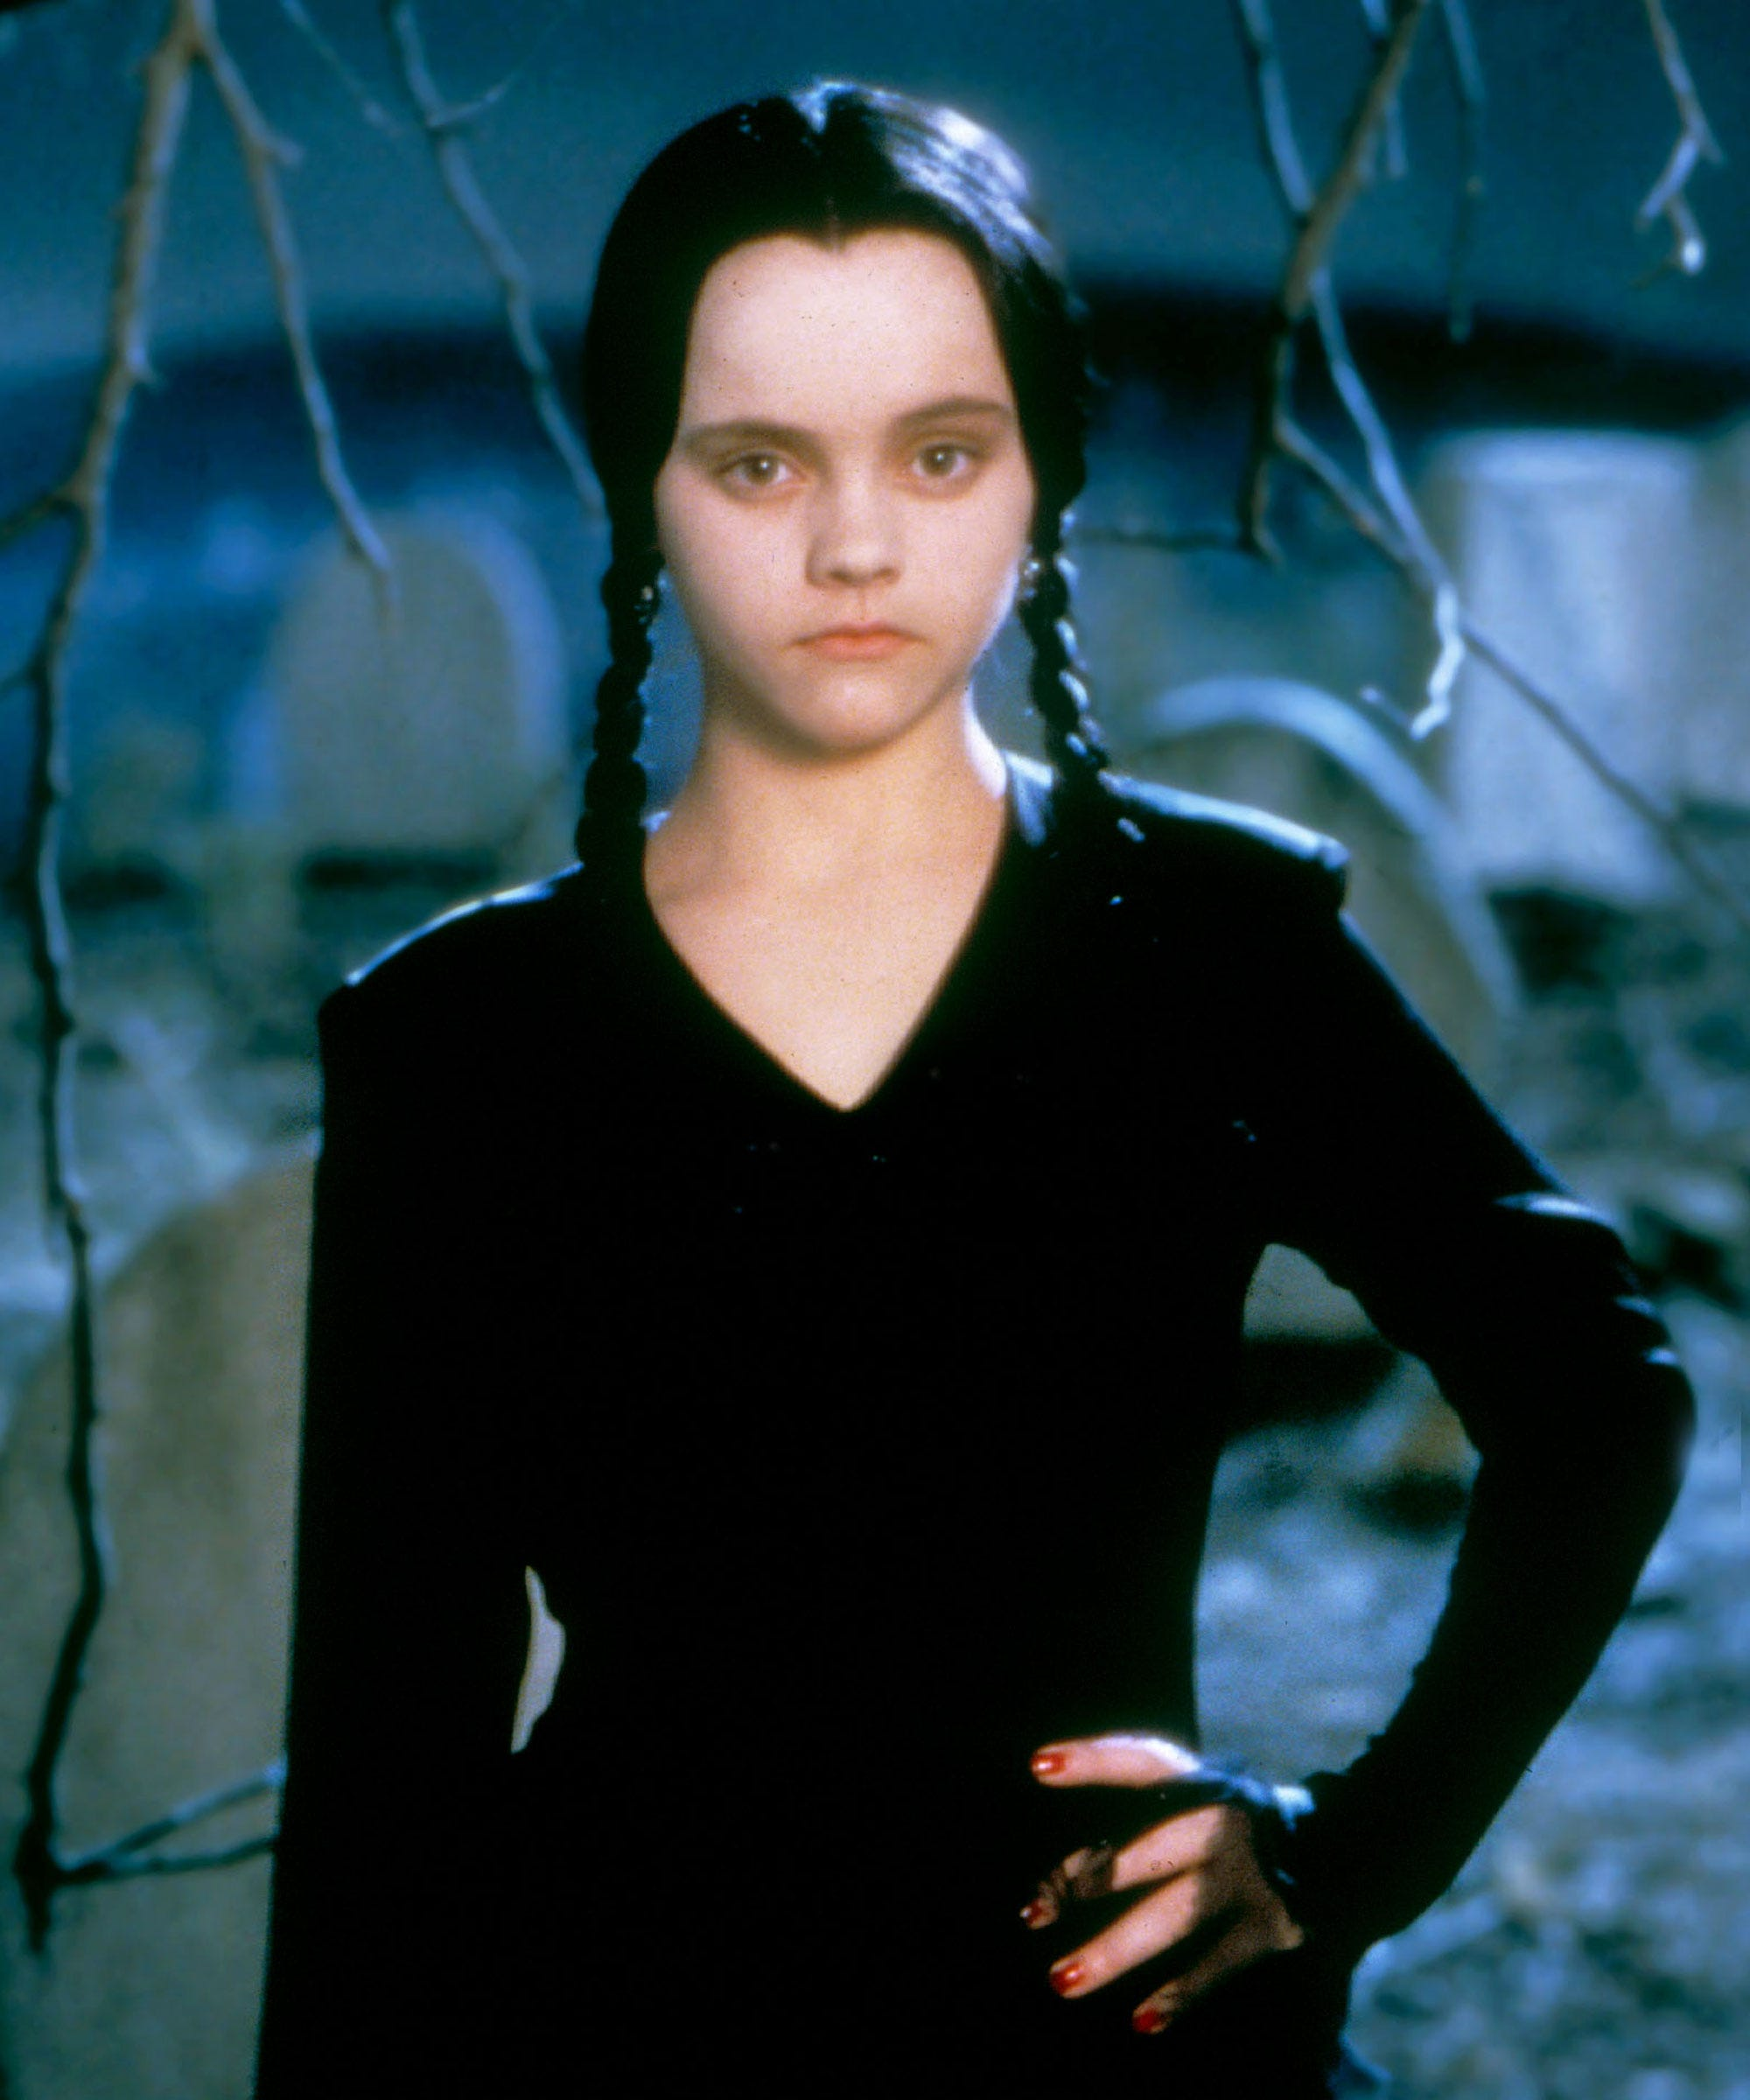 wednesday addams halloween costume wig dress all black - Halloween Costumes Wednesday Addams